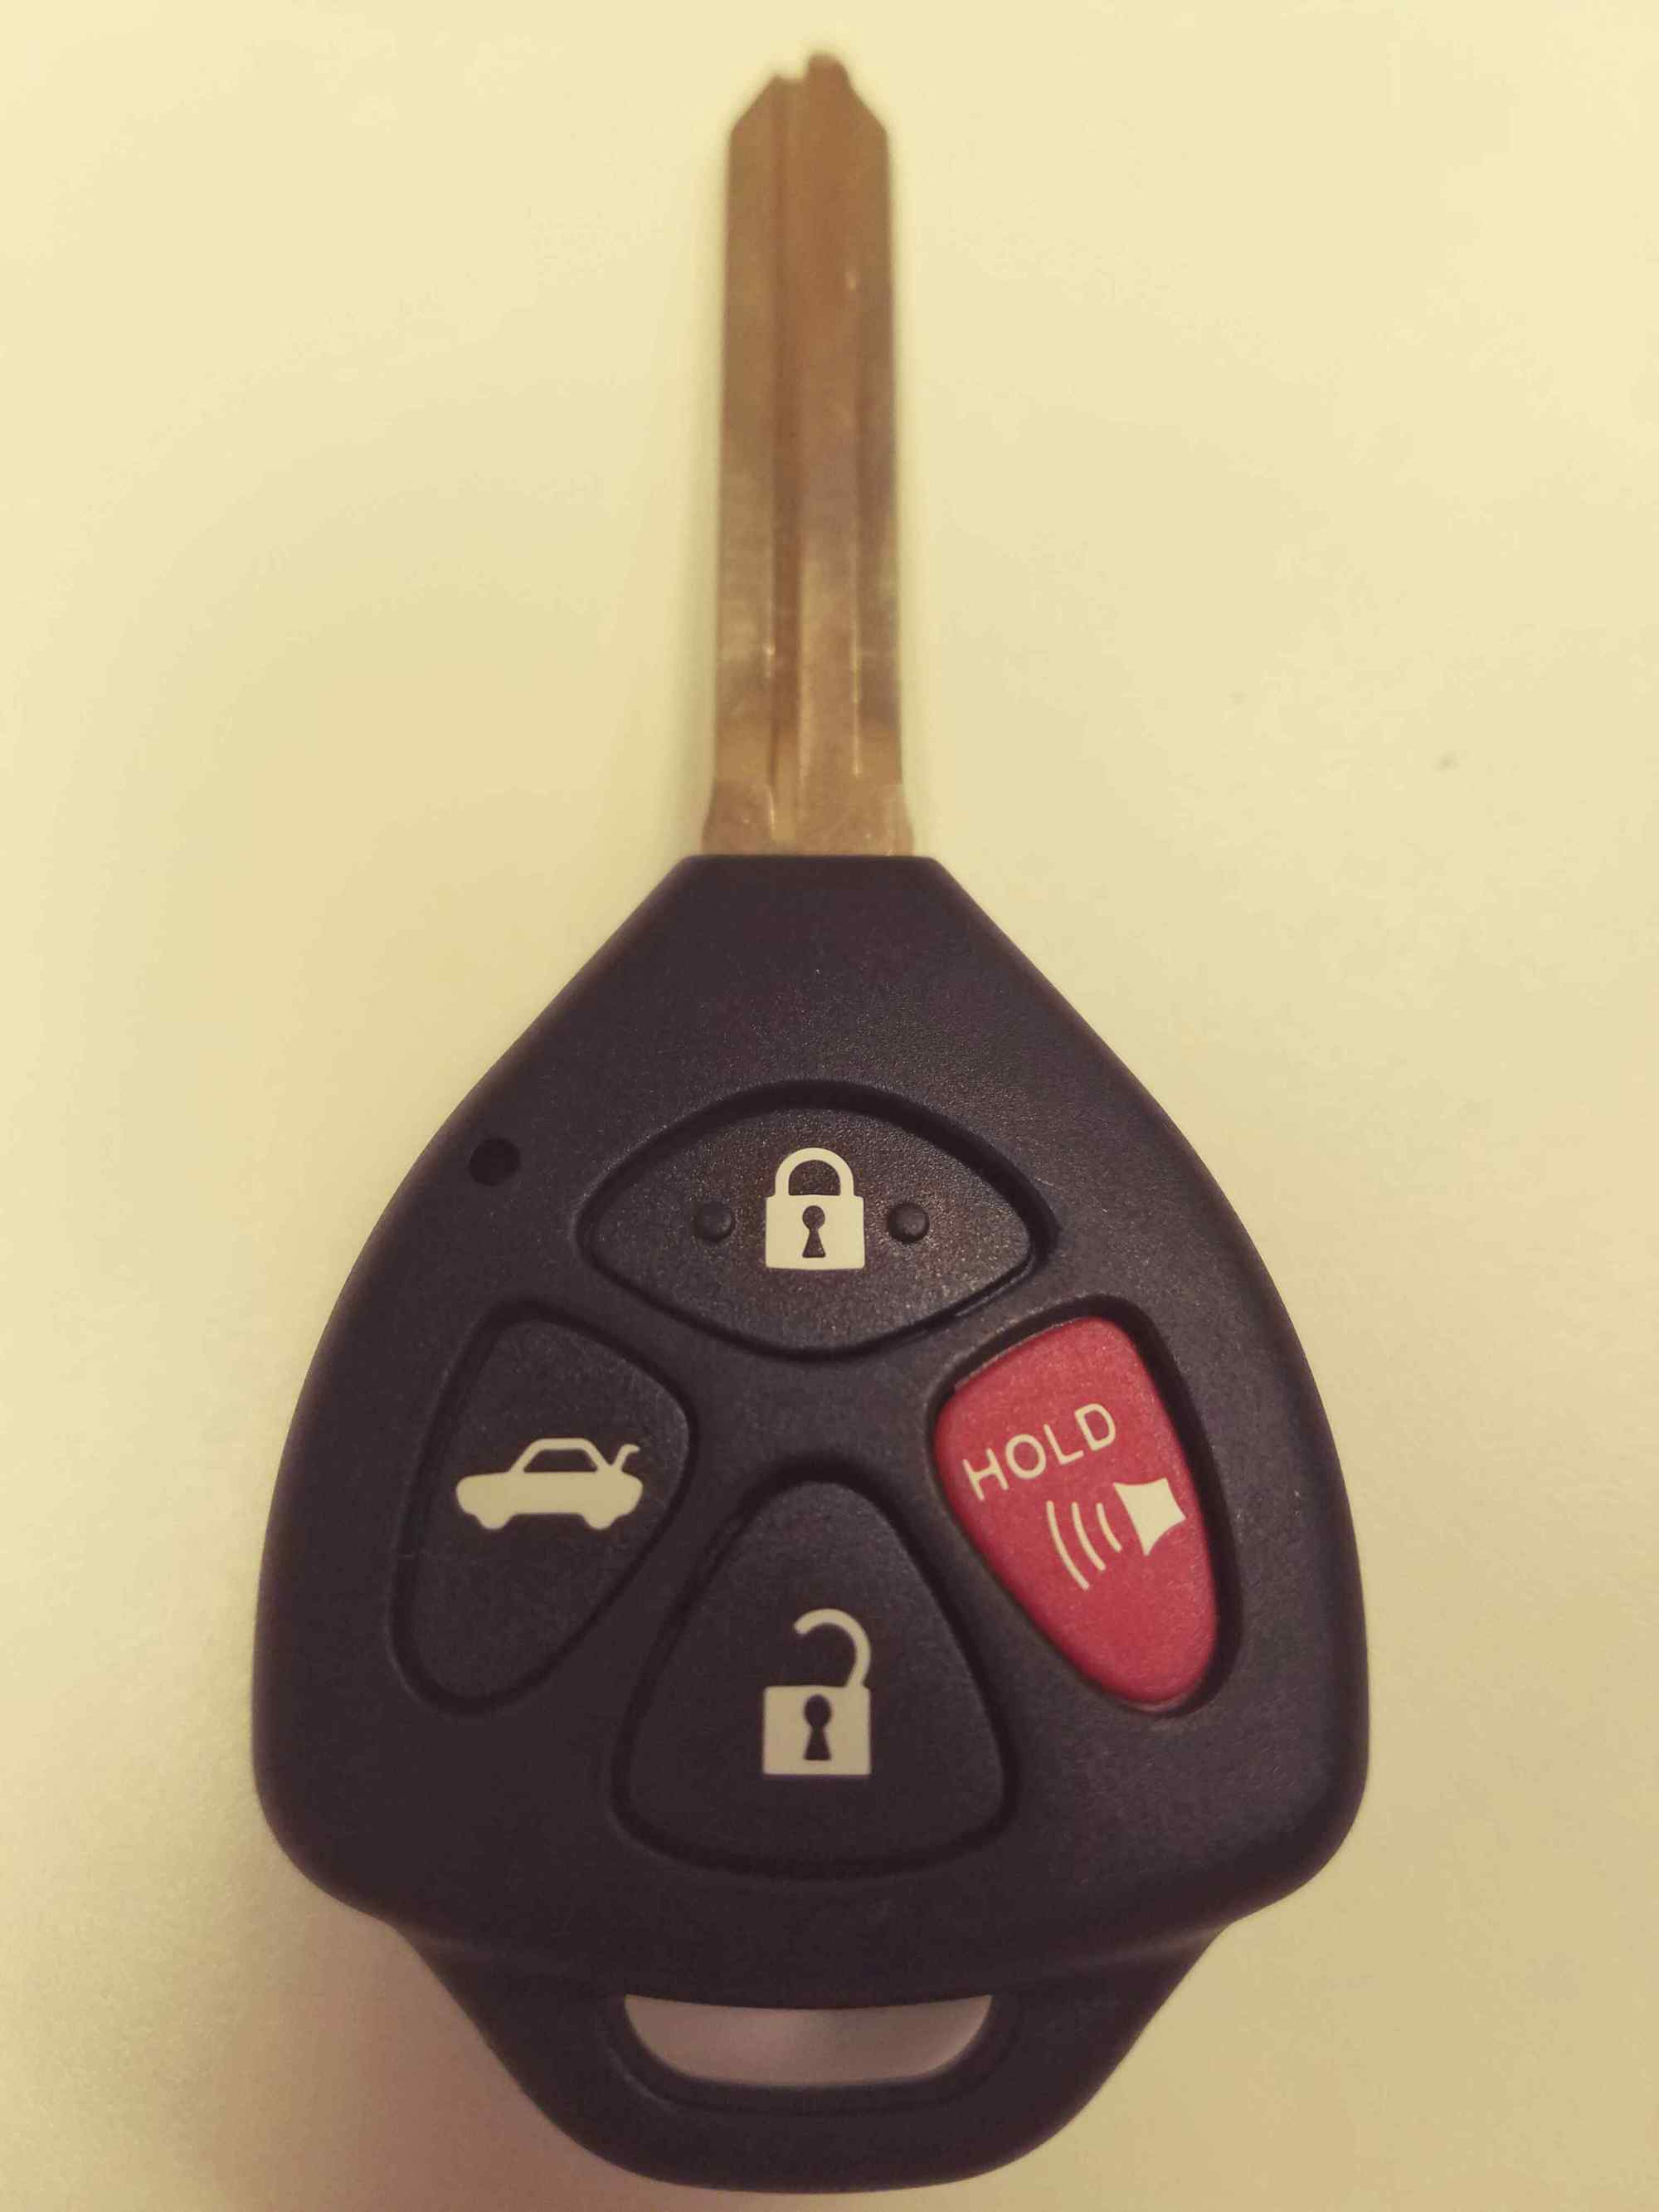 hight resolution of toyota corolla key